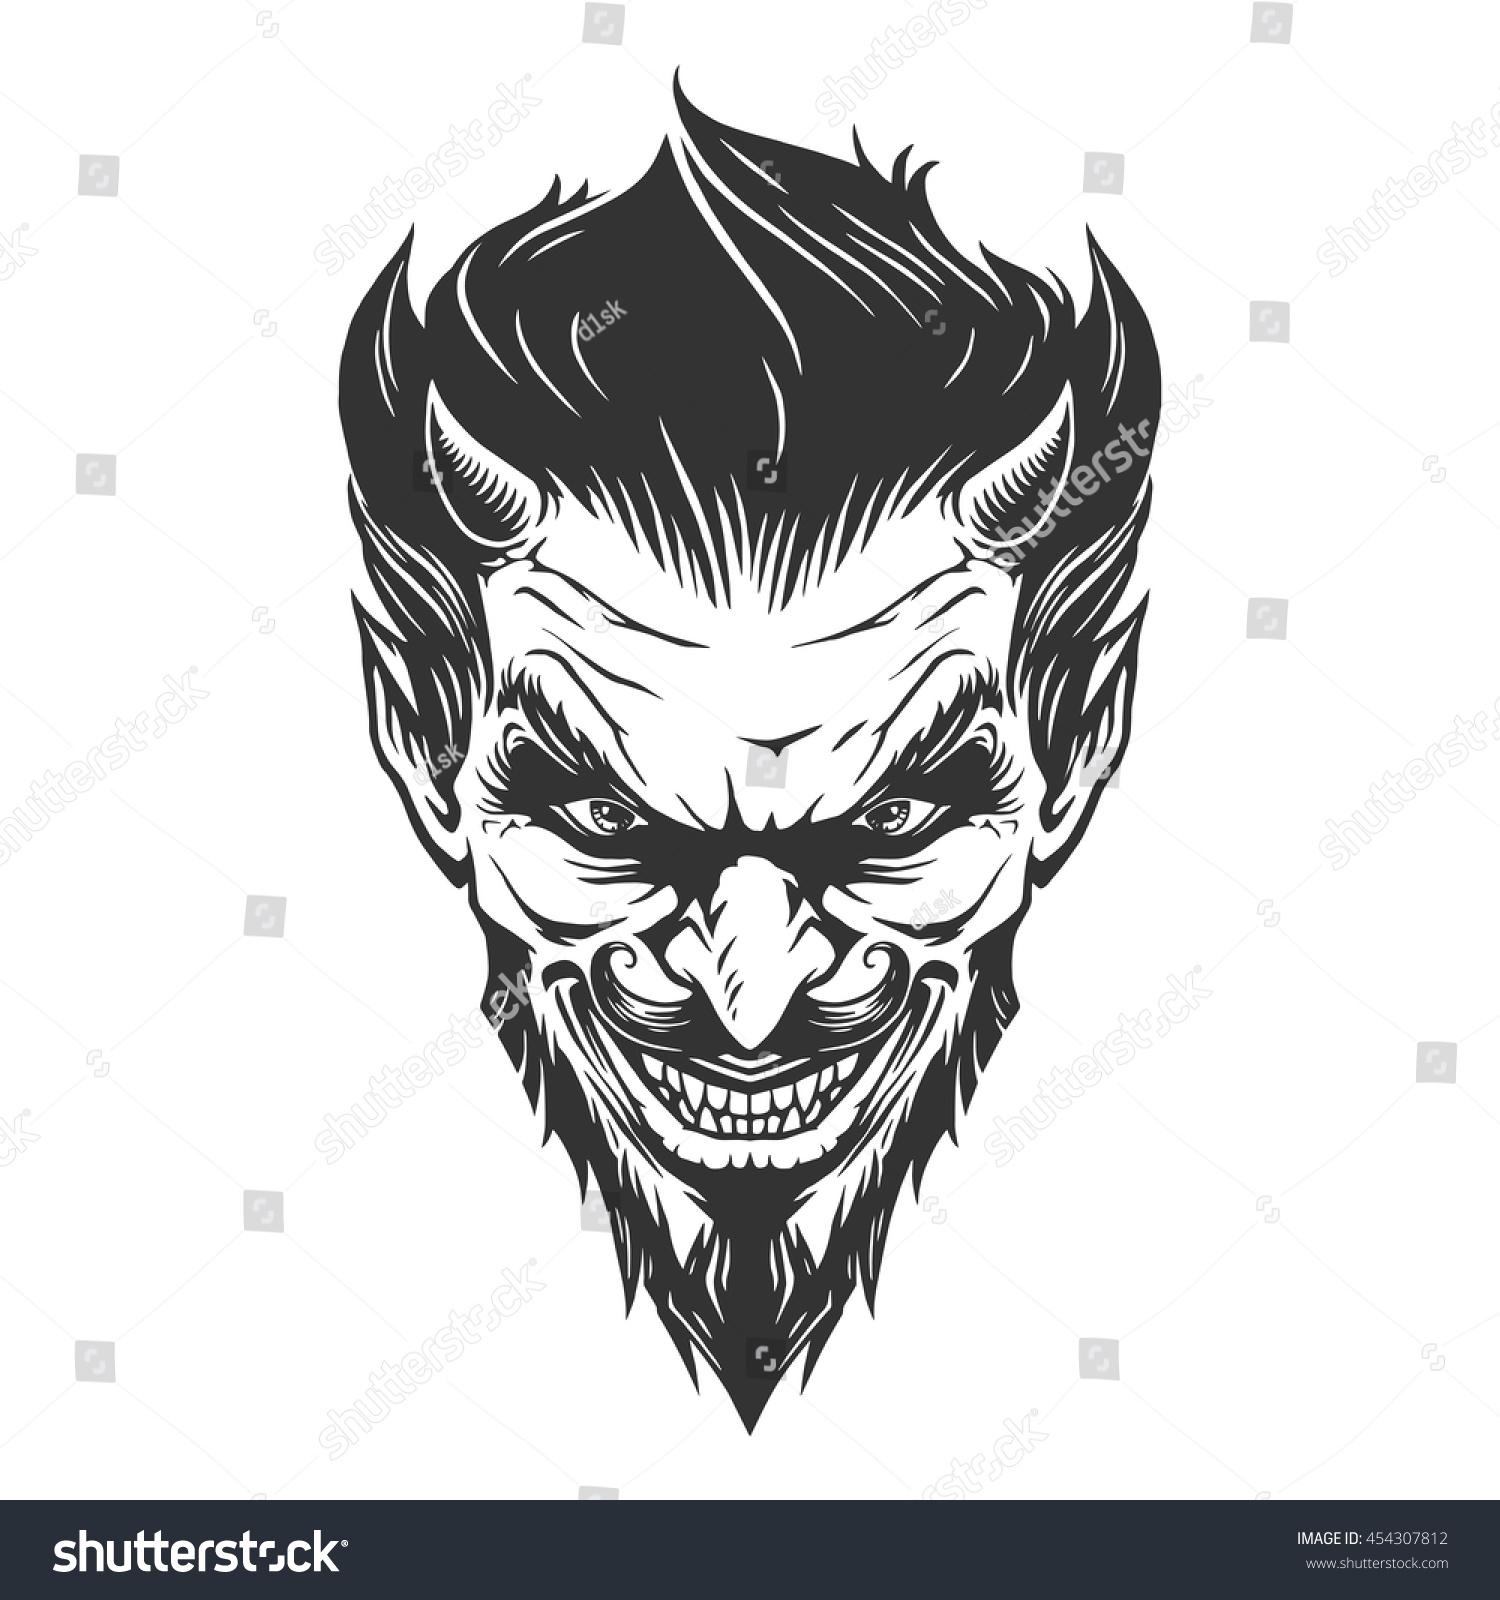 30 Ide Keren Gambar Joker Sketsa 2019 Tea And Lead